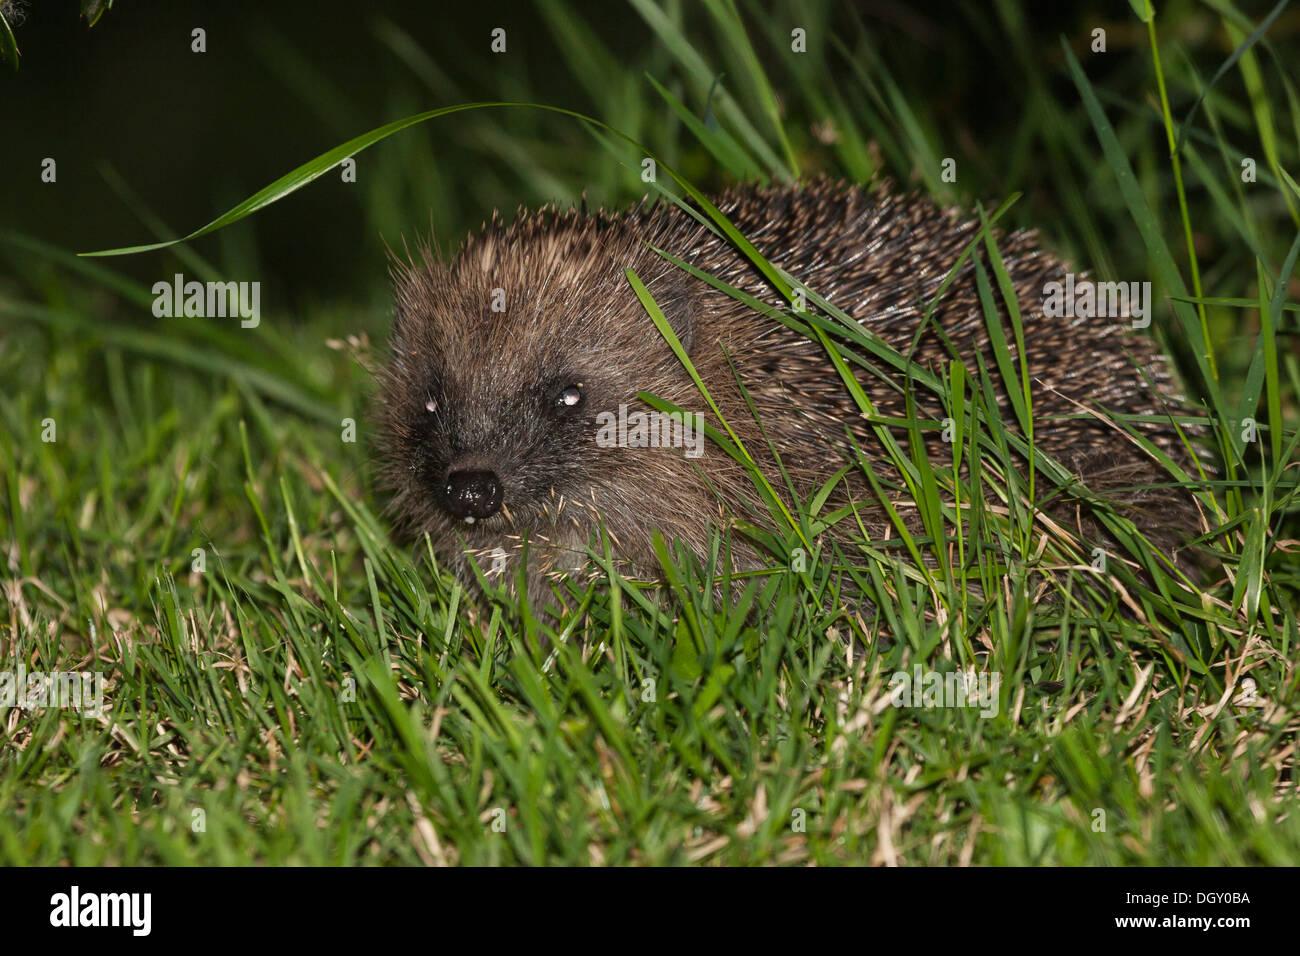 eurpoean hedgehog at night - Stock Image